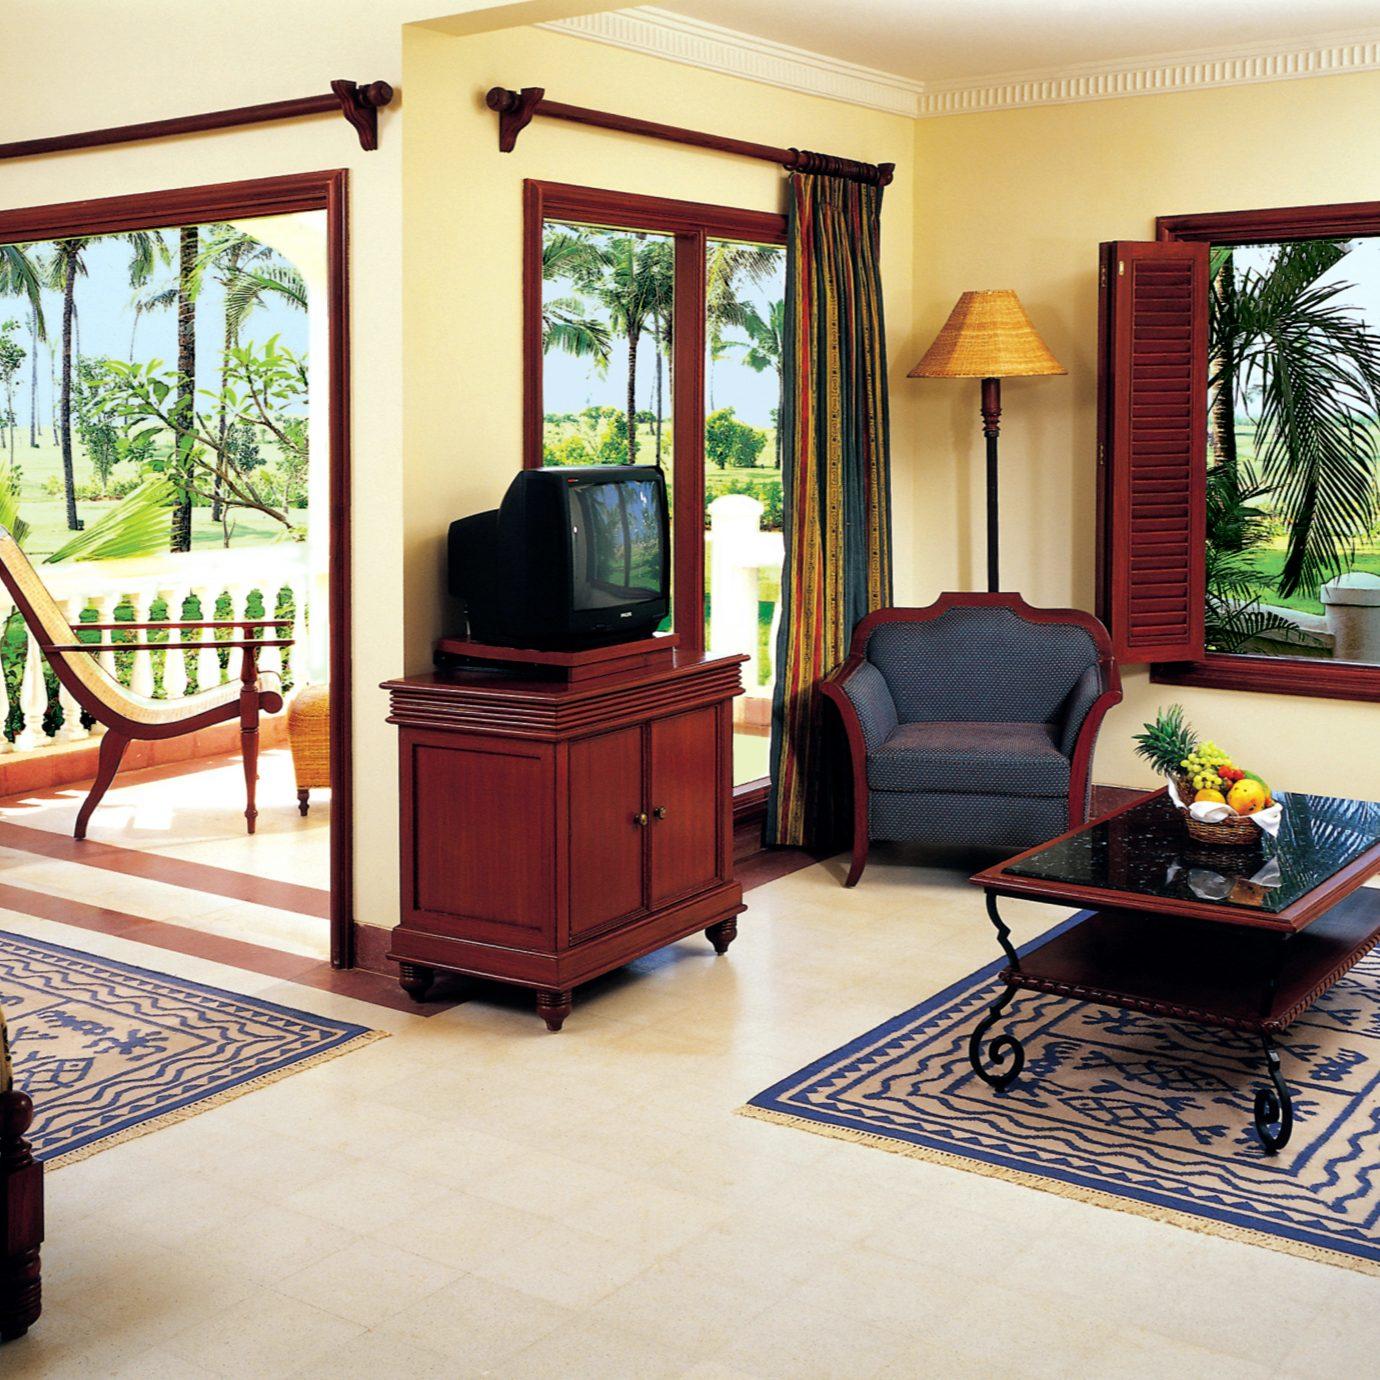 Bedroom Suite property home Villa cottage living room condominium mansion